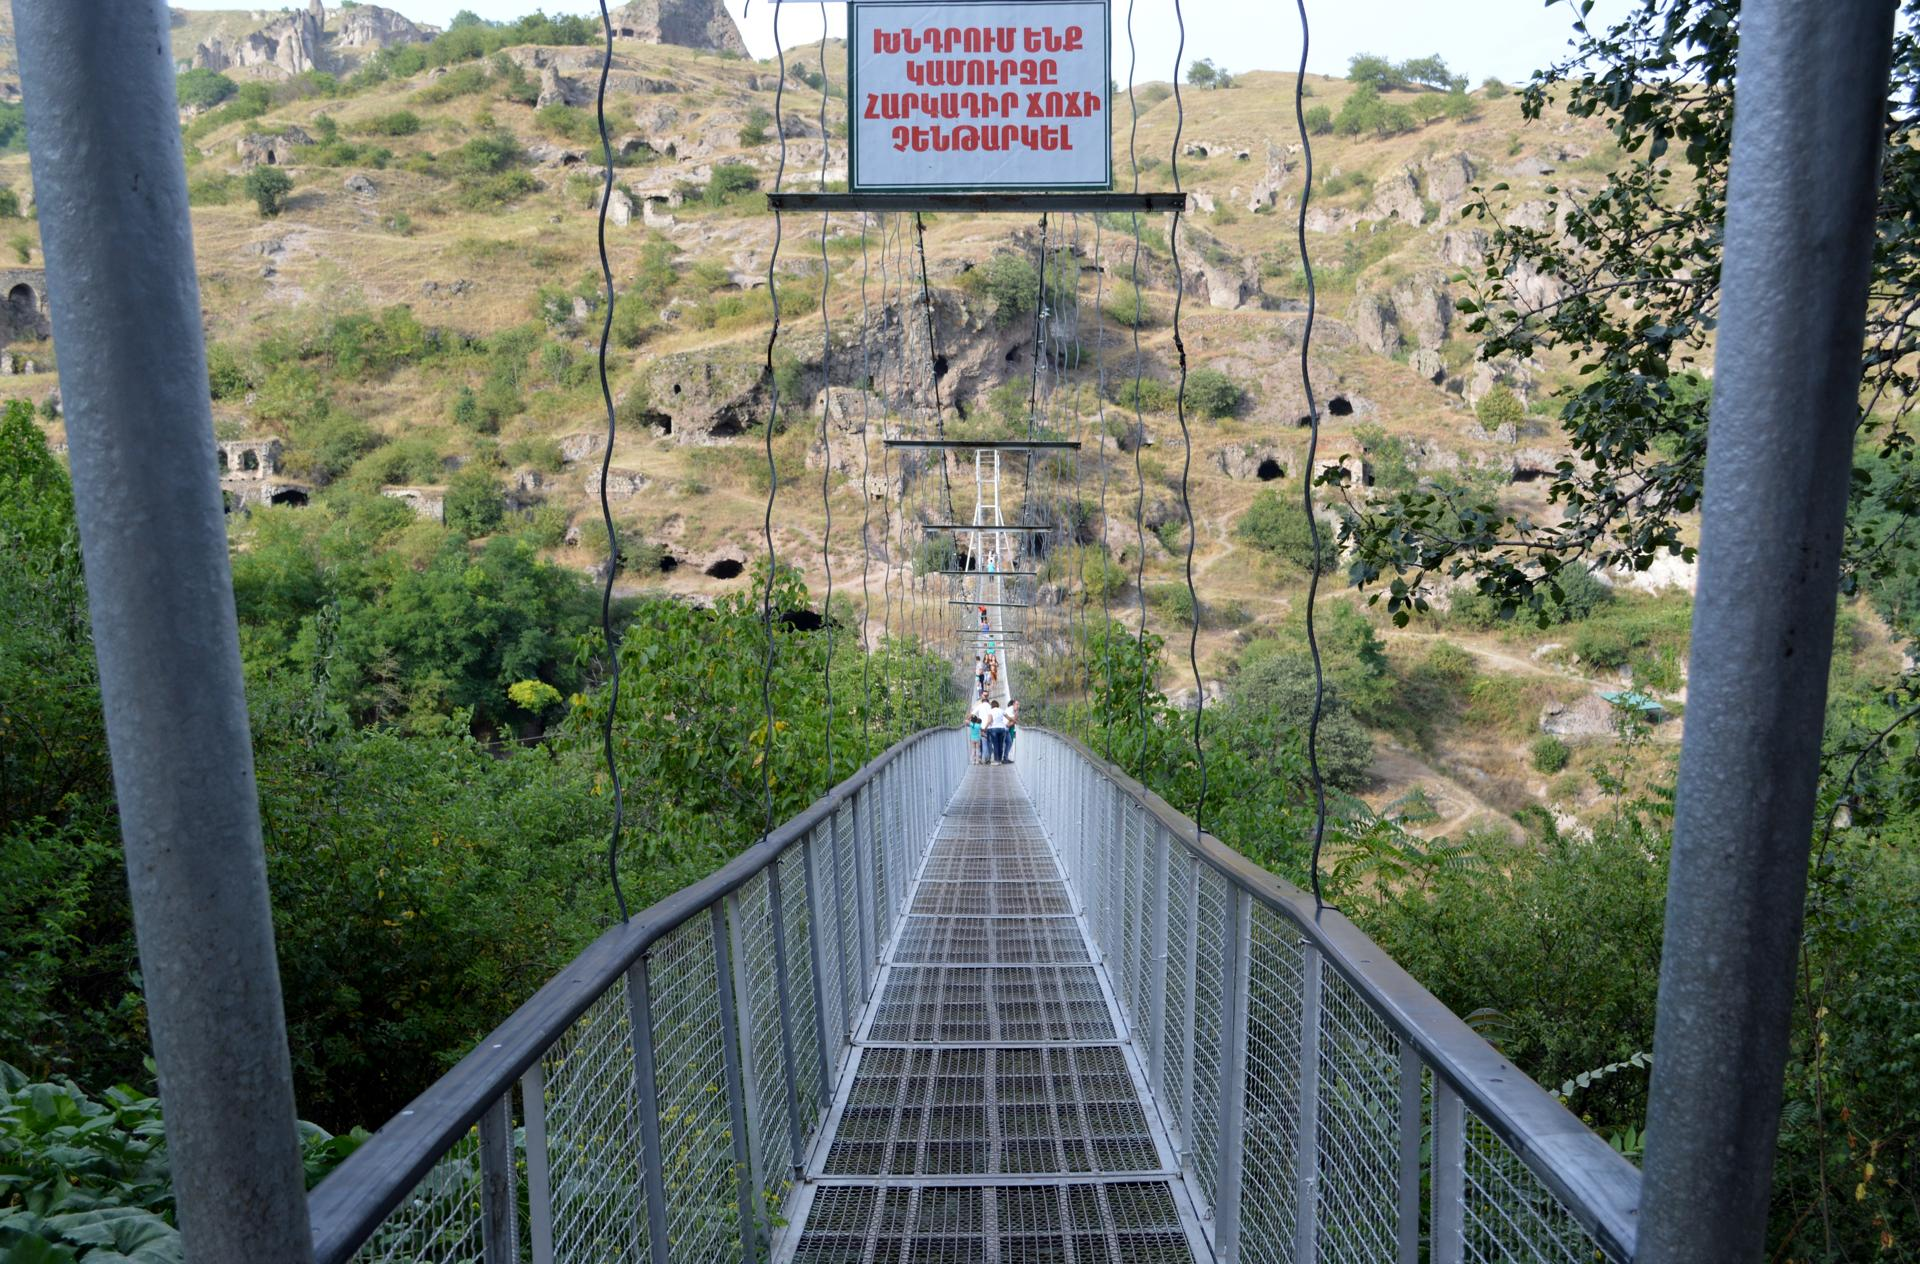 29armenia - Khnzoresk bridge. (Juliet Pennington for The Boston Globe)